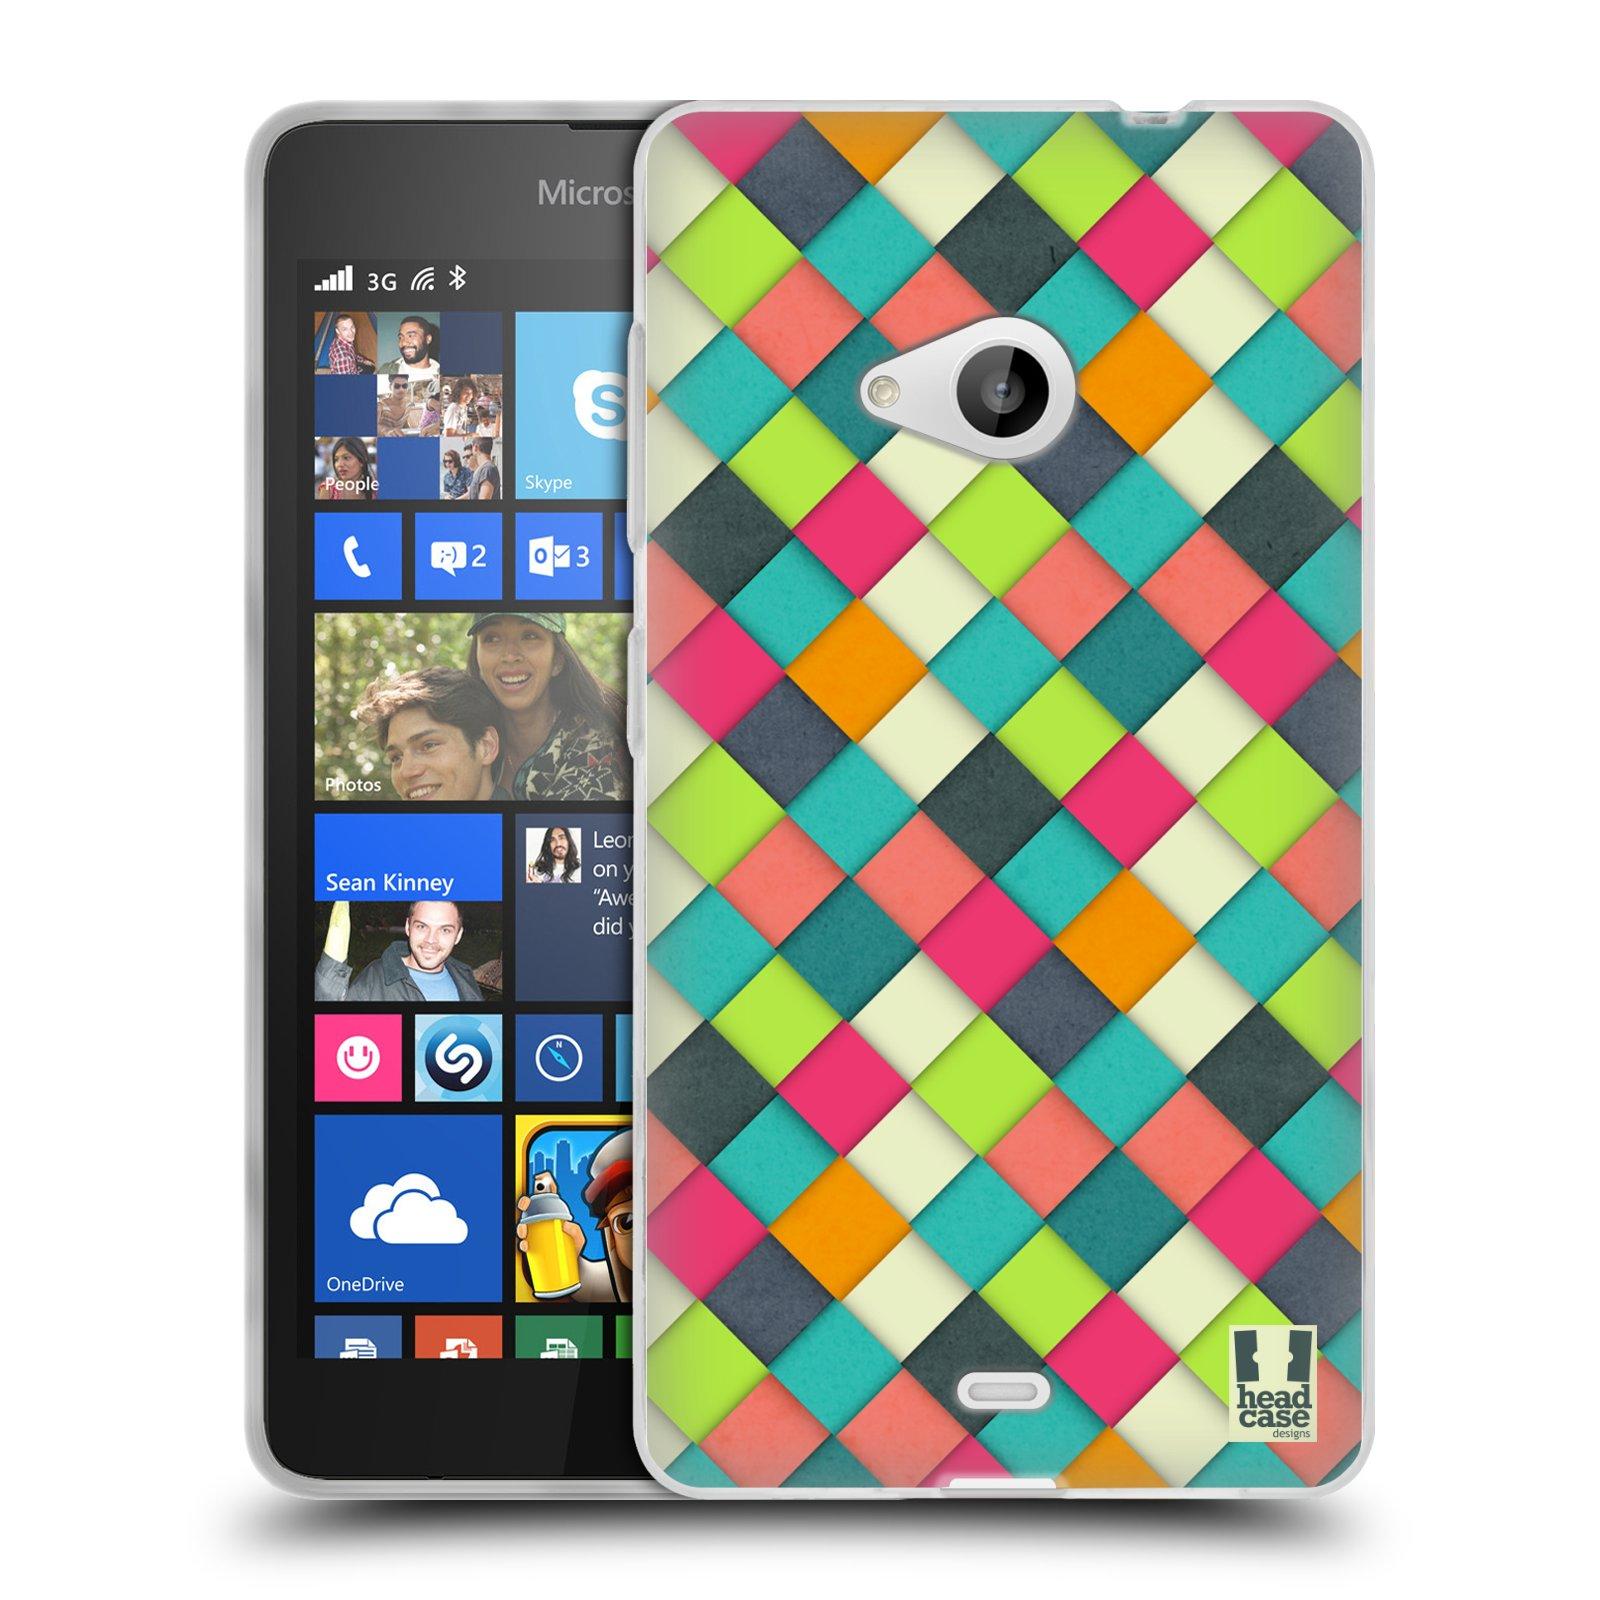 Silikonové pouzdro na mobil Microsoft Lumia 535 HEAD CASE WOVEN (Silikonový kryt či obal na mobilní telefon Microsoft Lumia 535)